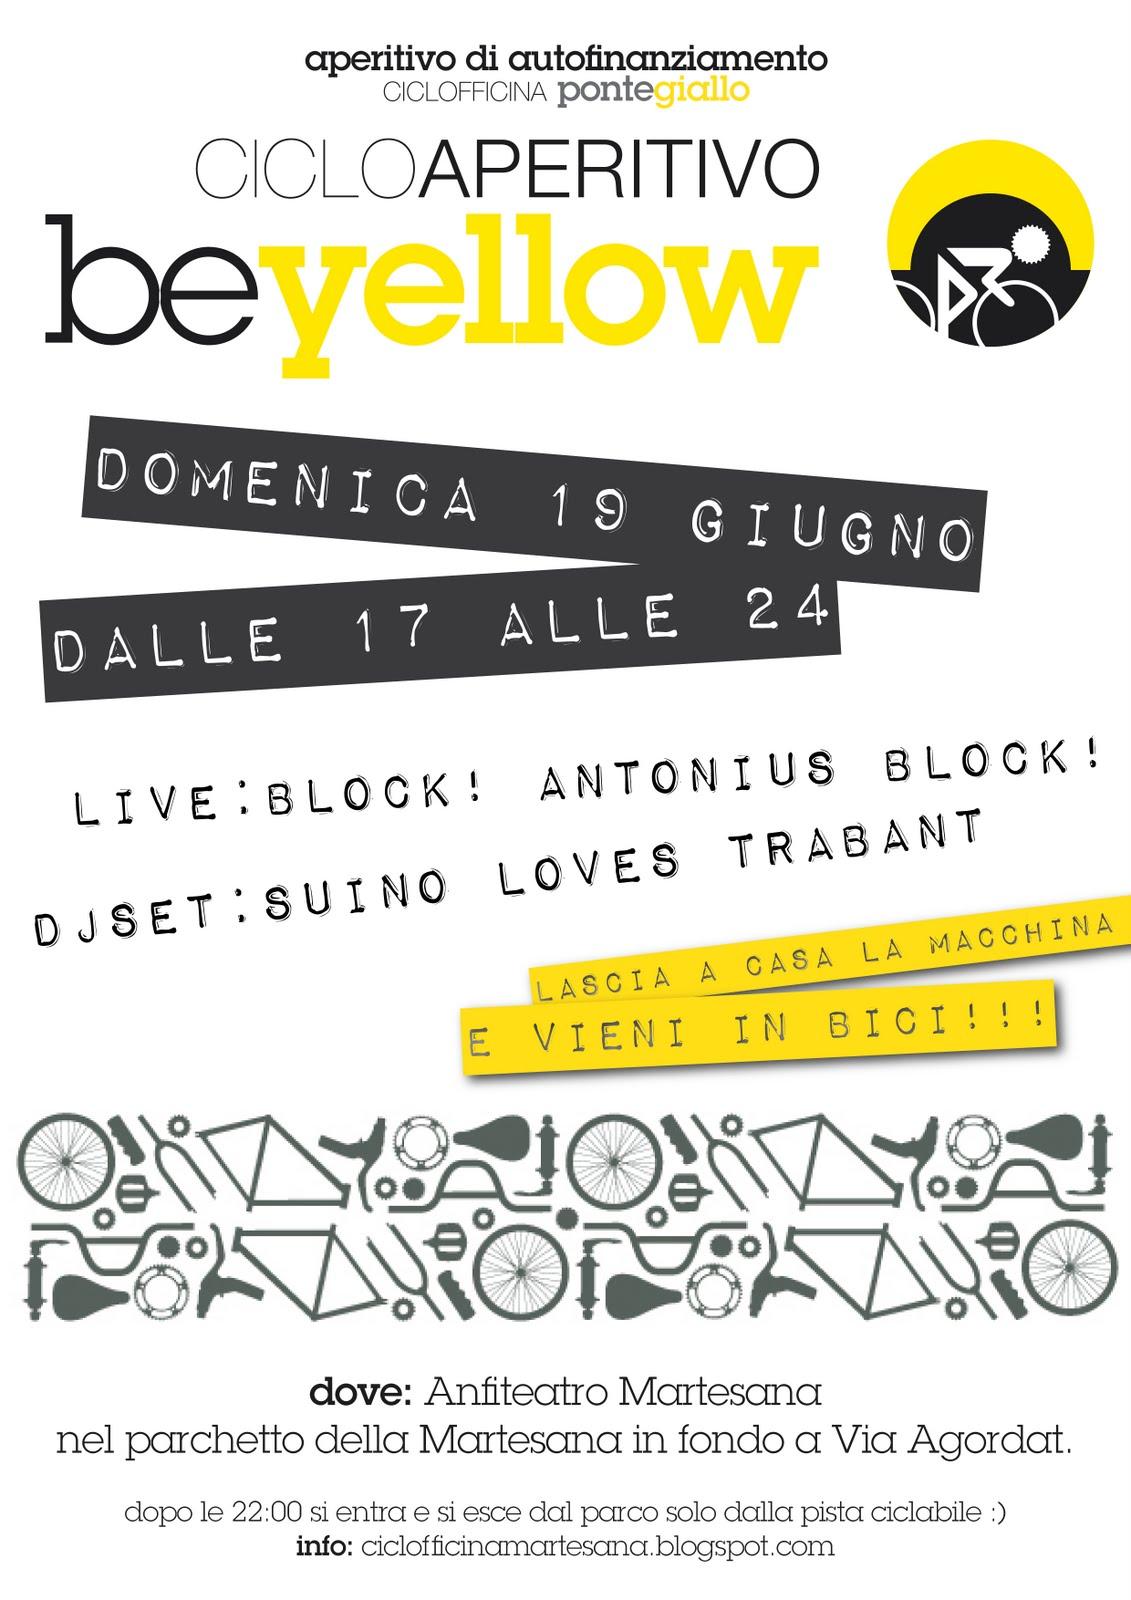 beyellow-01.jpg